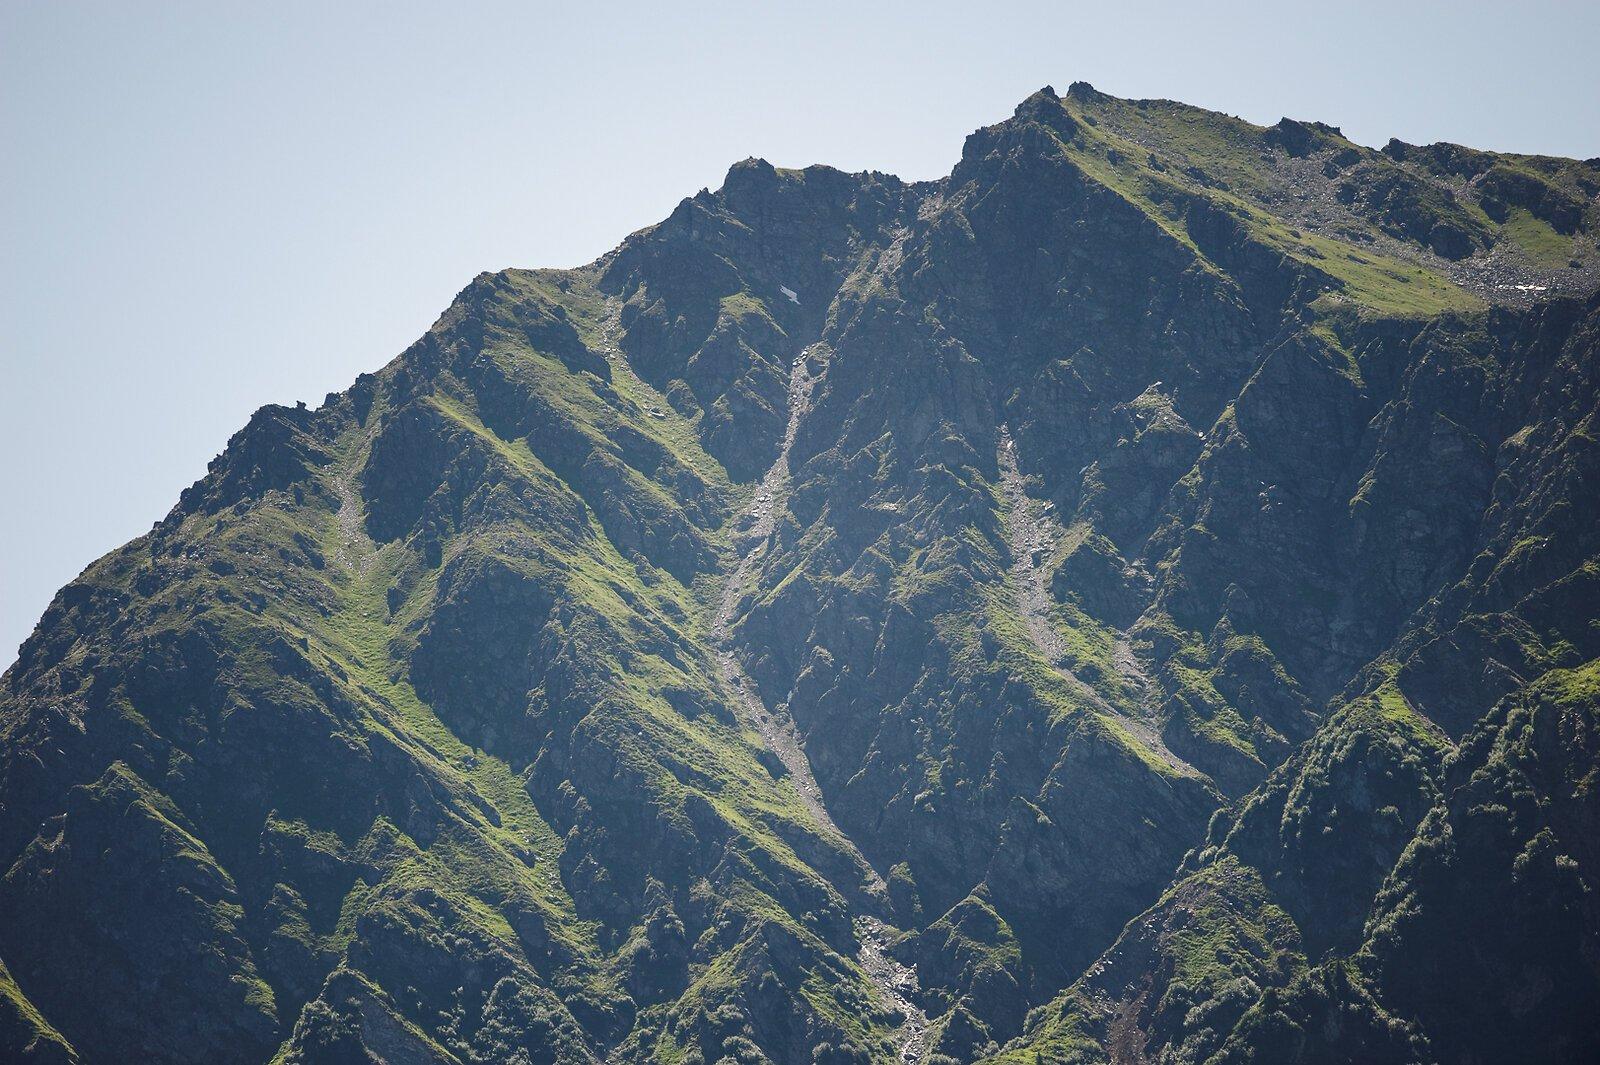 2012-Klosters_2012-07-18_11-29-00_01412_DxO.jpg